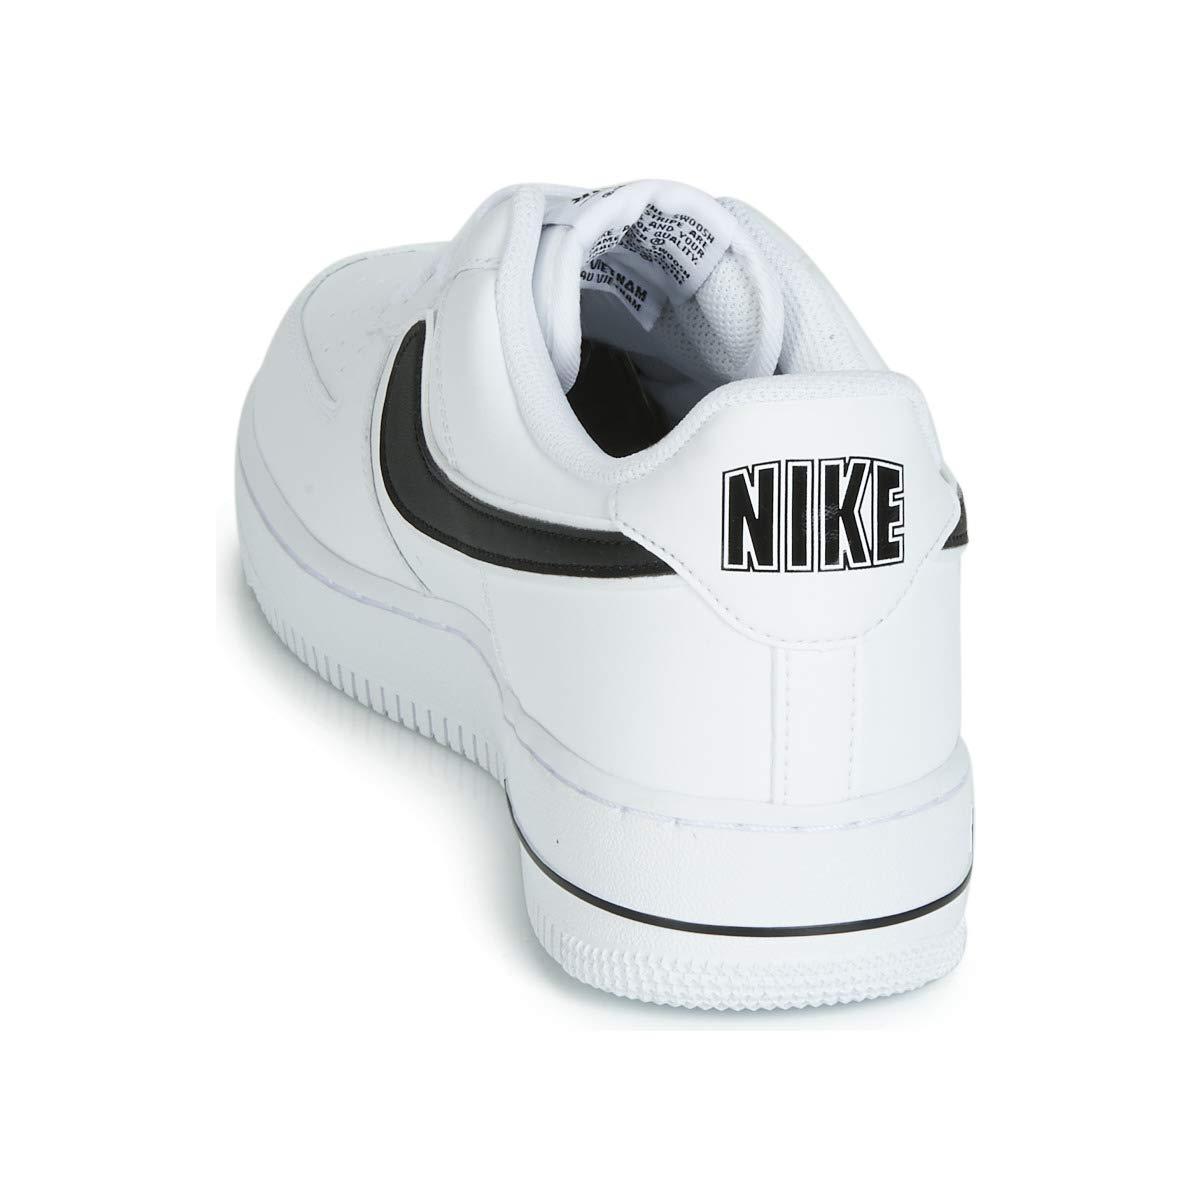 Nike Free Free Nike 4.0 s Print Laufschuhe 371689